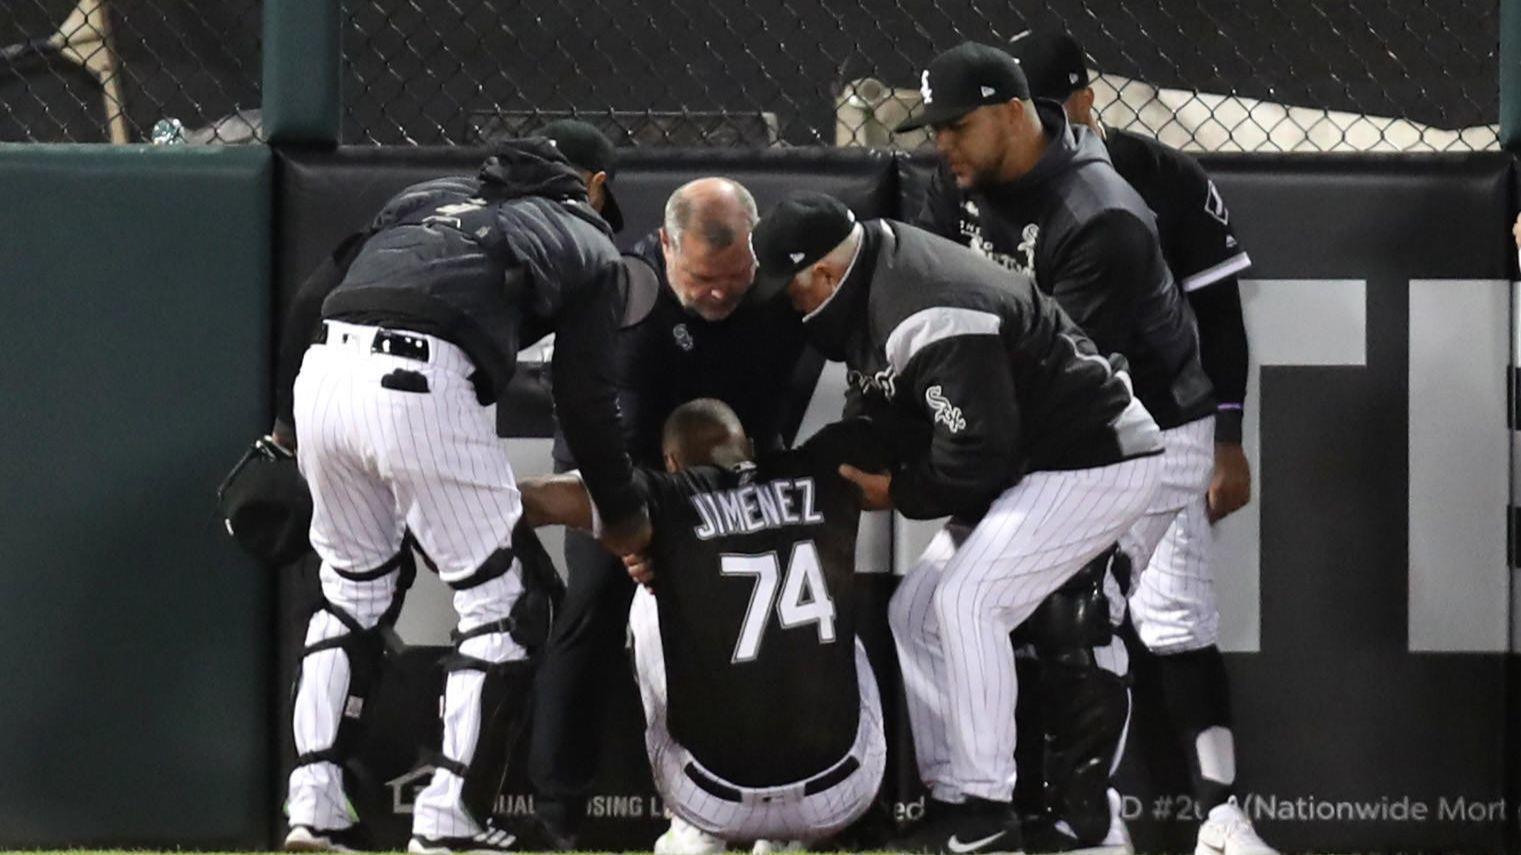 6a8414f54 ... 2019 White Sox place left-fielder Eloy Jimenez on 10-day injured list.  Chicago Tribune - 11 25 AM ET April 28